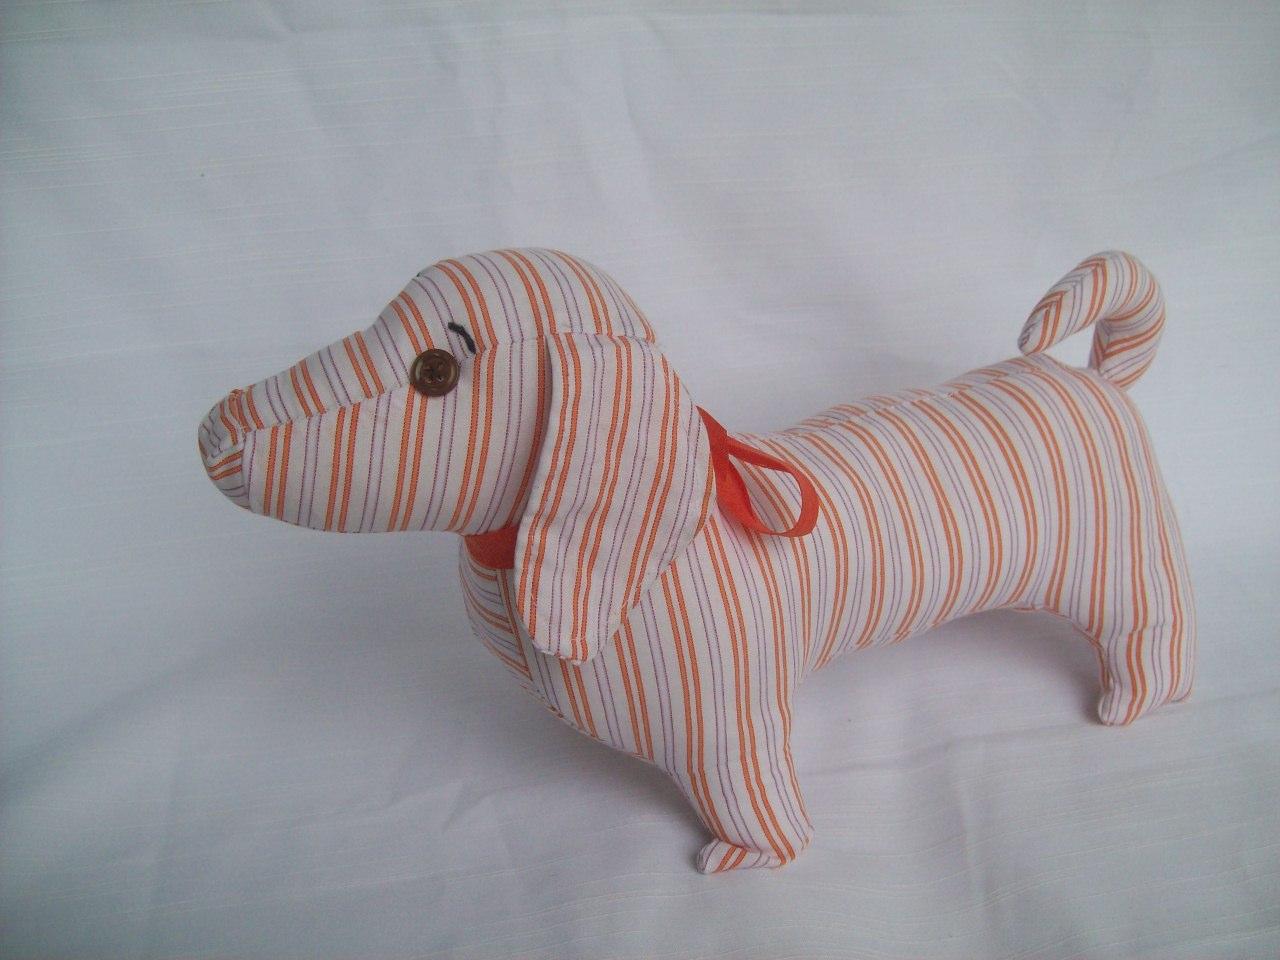 Мягкая игрушка с шарнирами своими руками